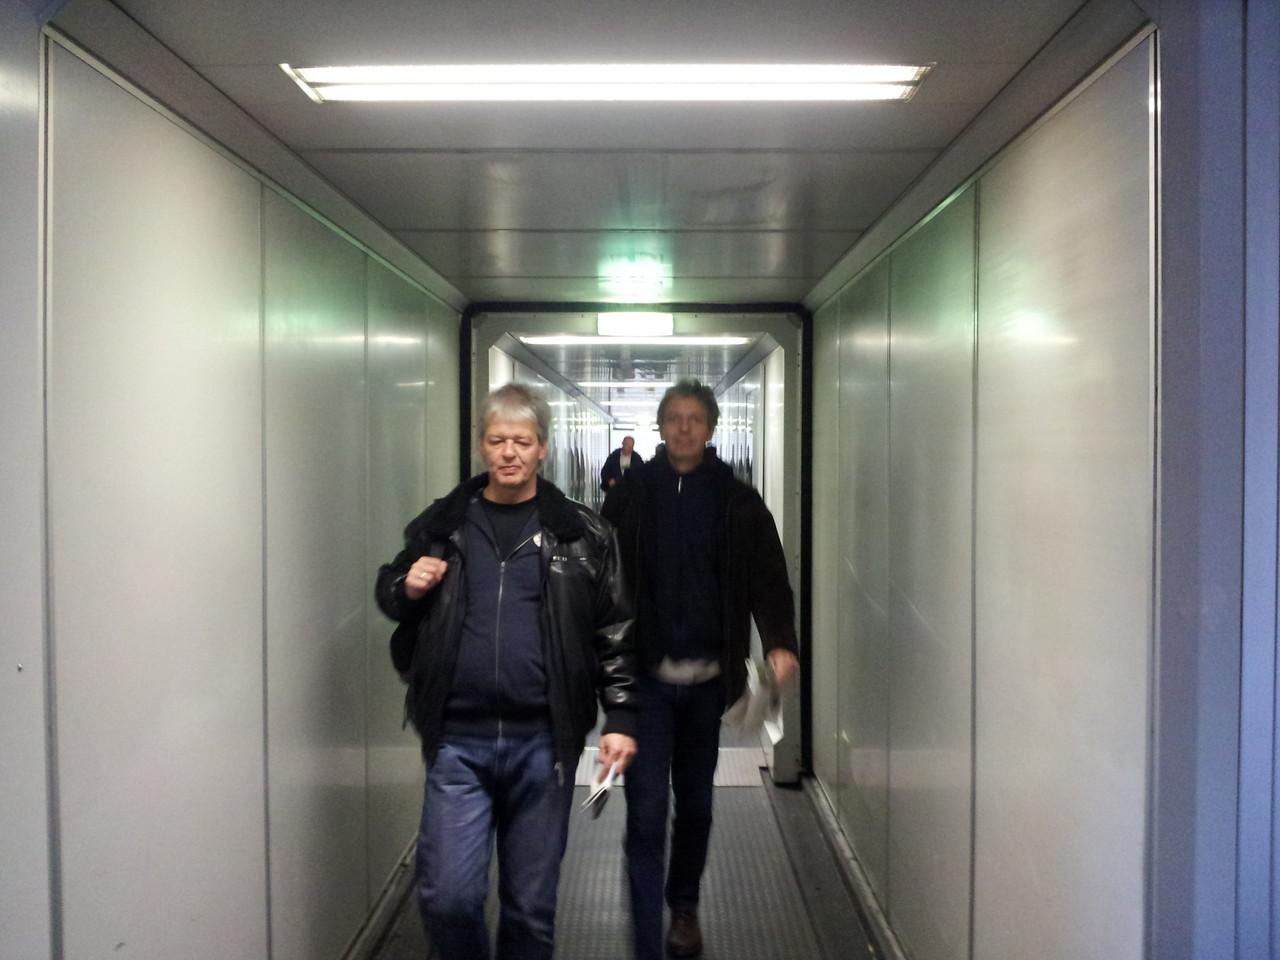 Boarding (16:45 Uhr)